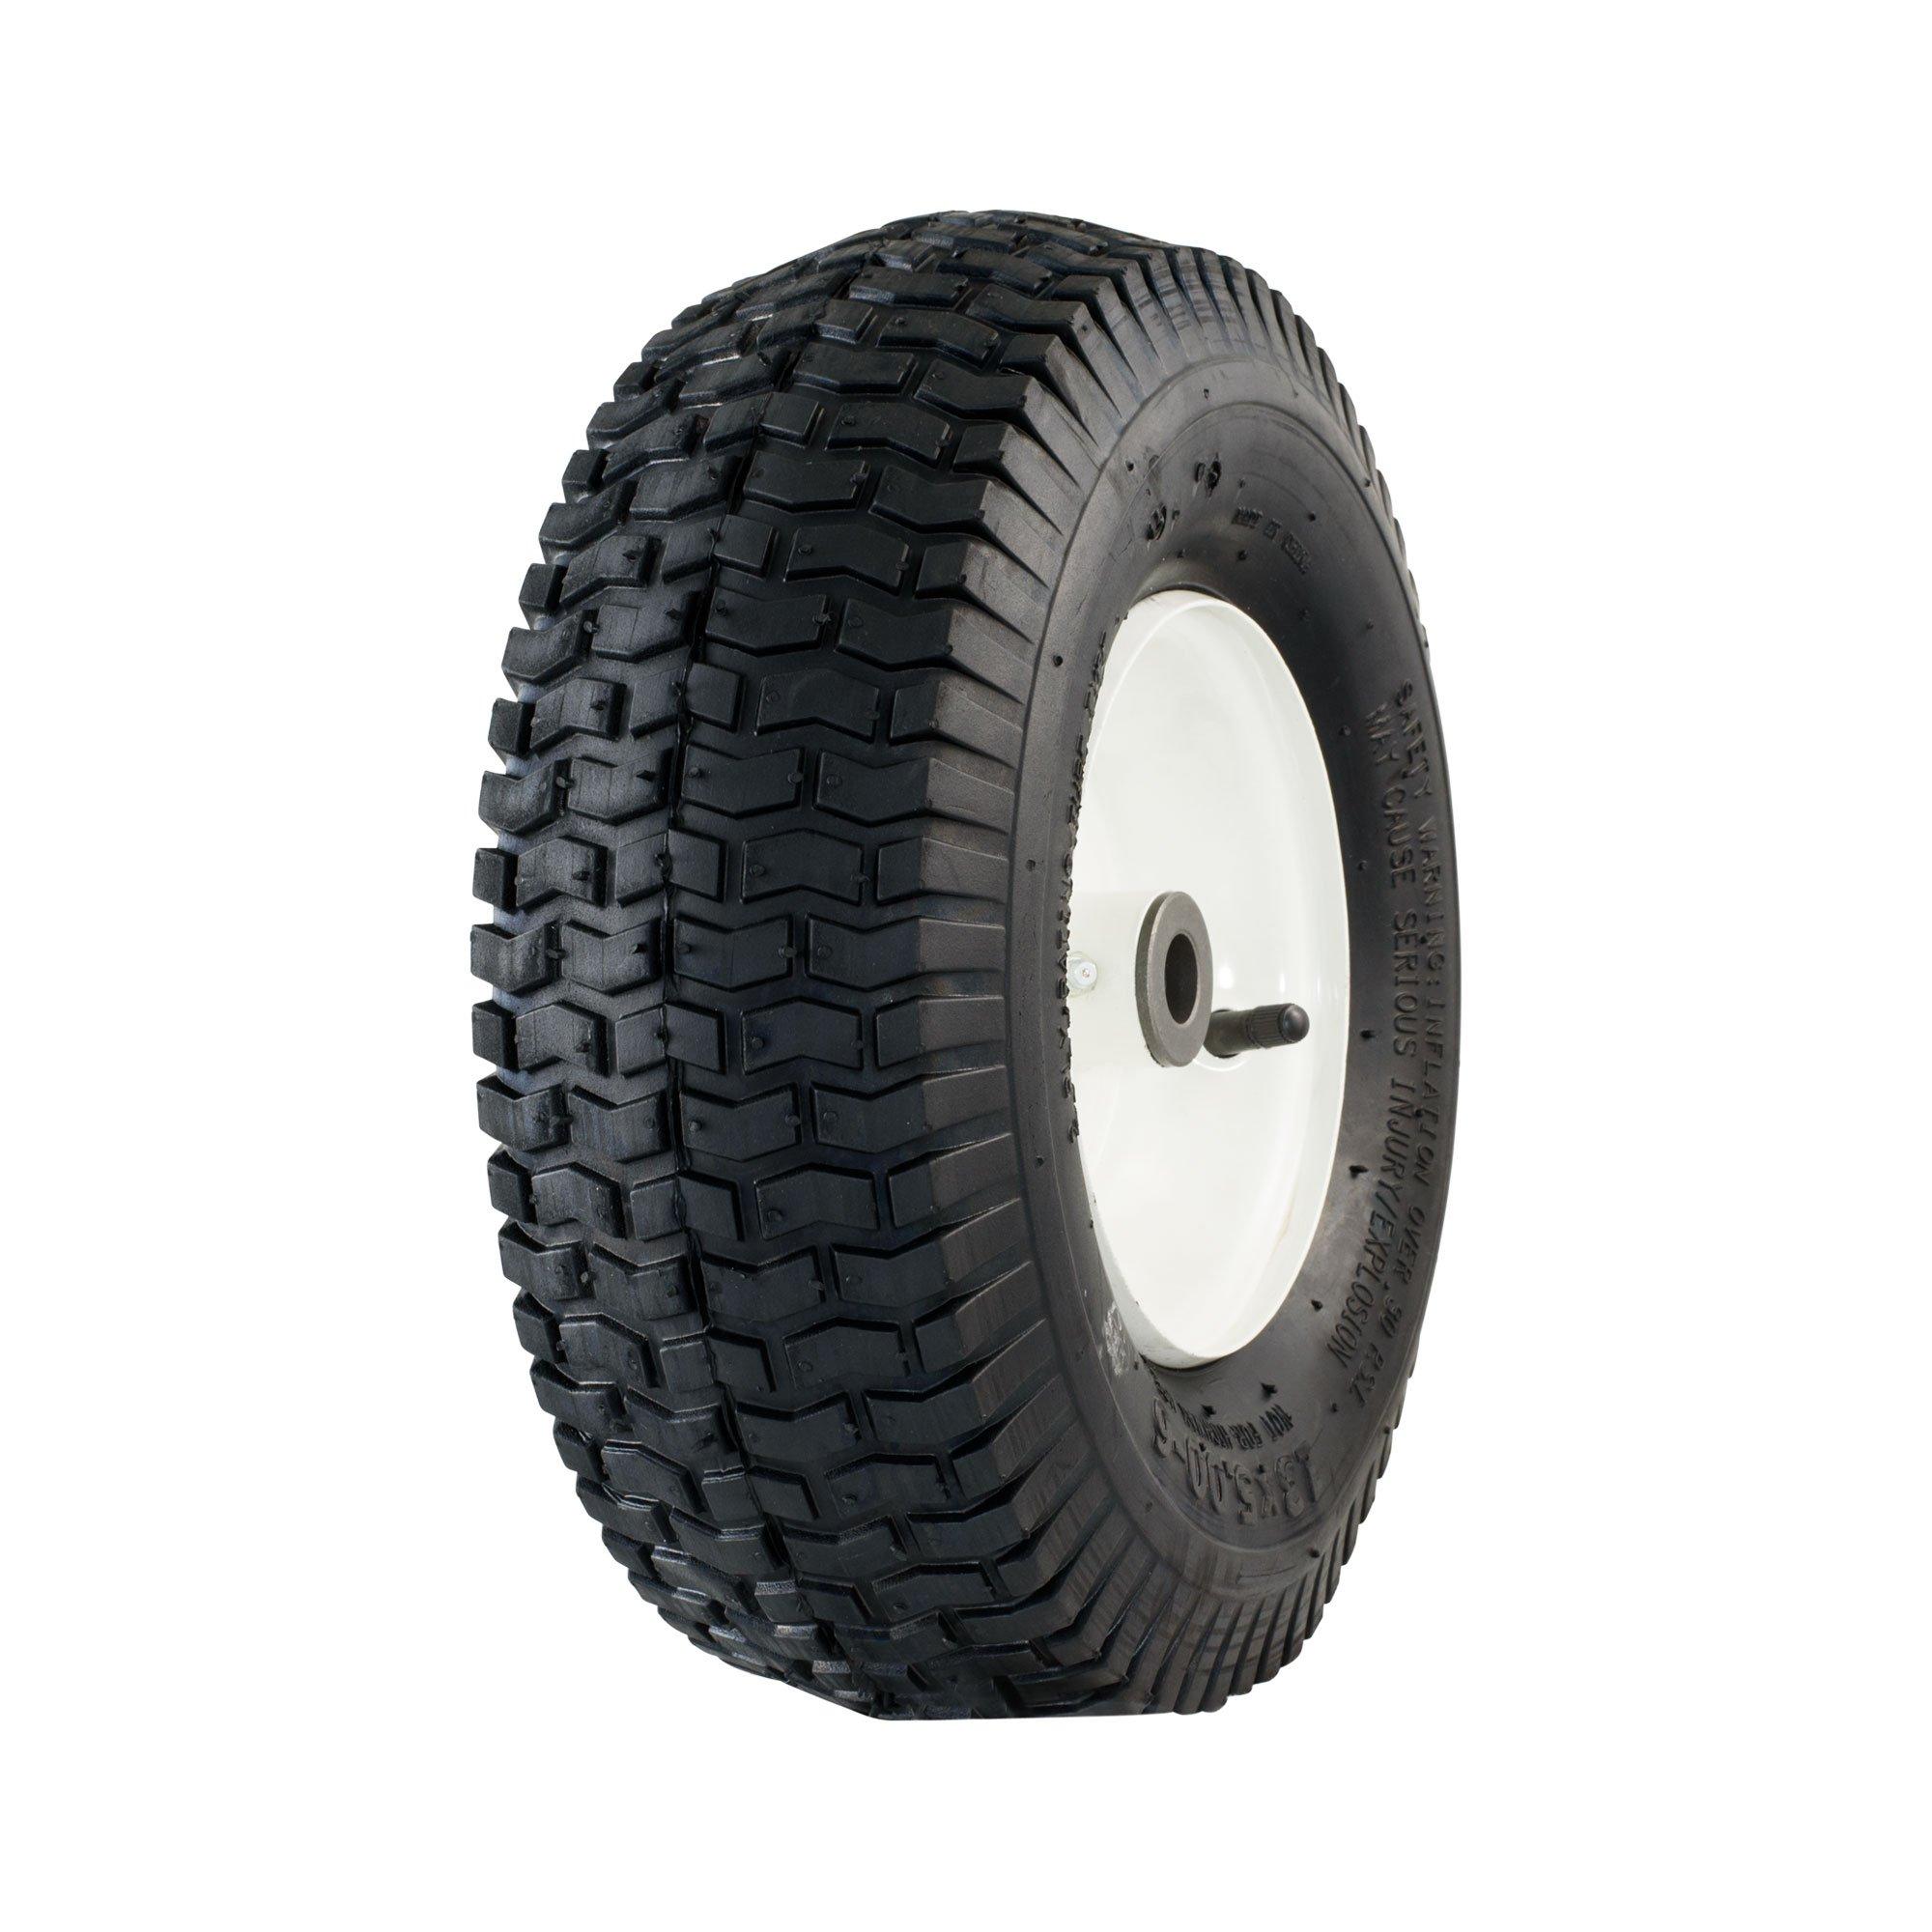 Marathon 20336 13x5.00-6'' Pneumatic (Air Filled) Tire on Wheel, 3'' Hub, 3/4 Bushings by Marathon Industries